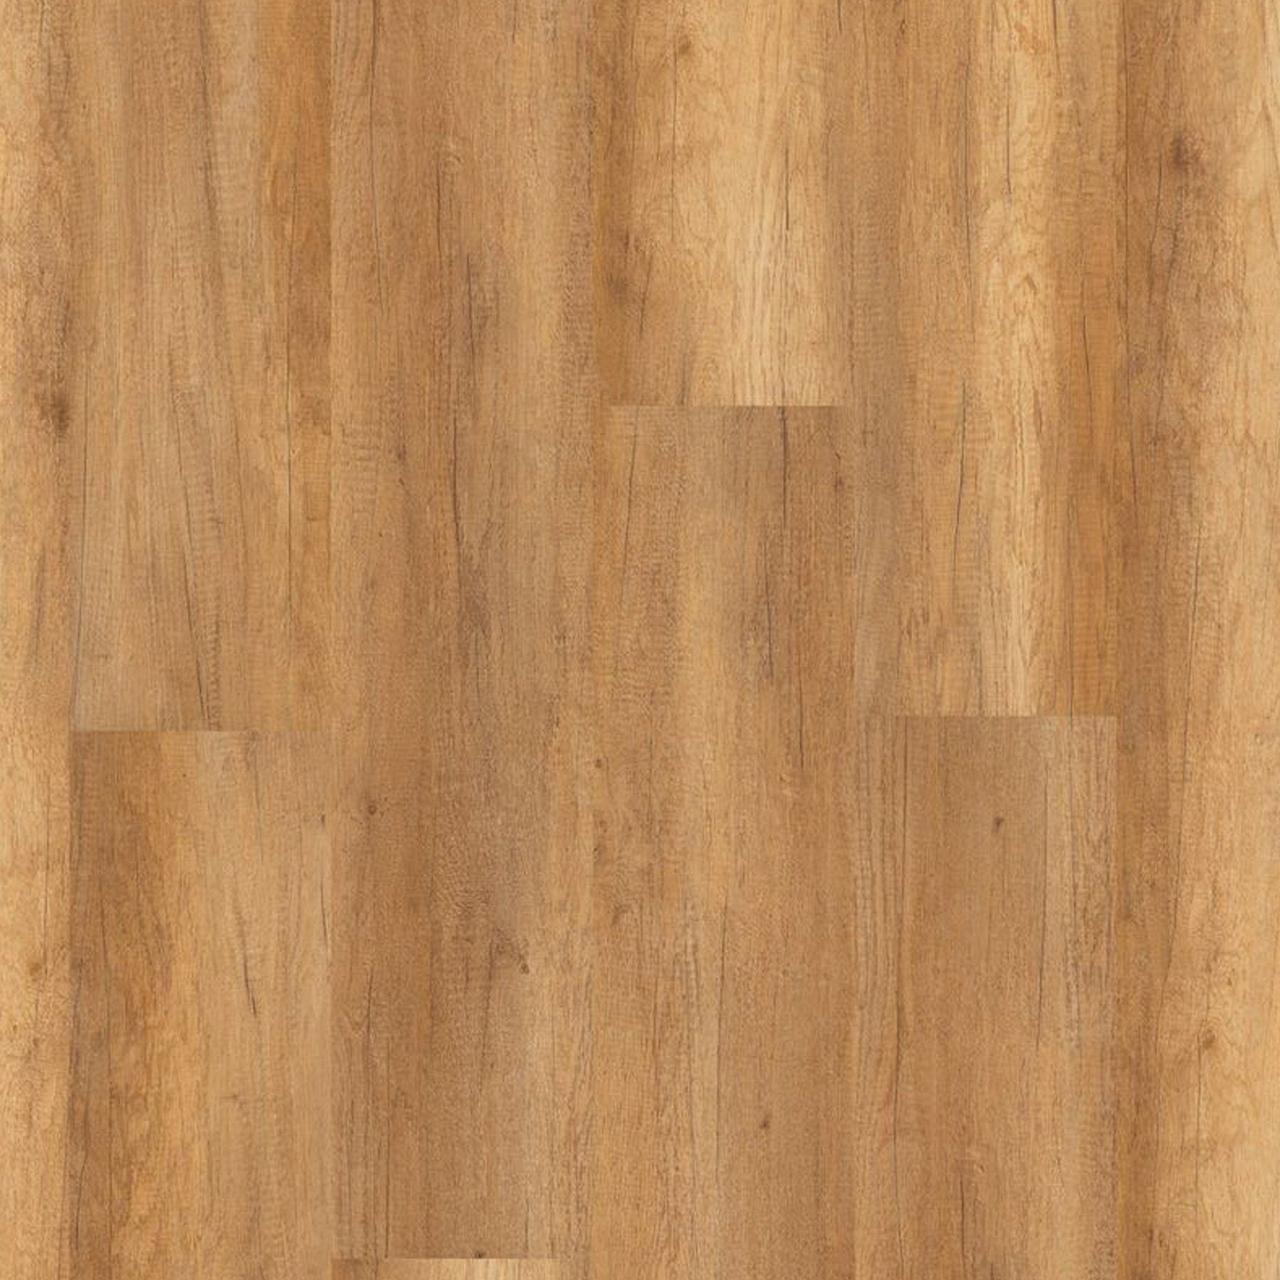 Біопол Purline Wineo 1000 MLP Wood XXL Calistoga Natur